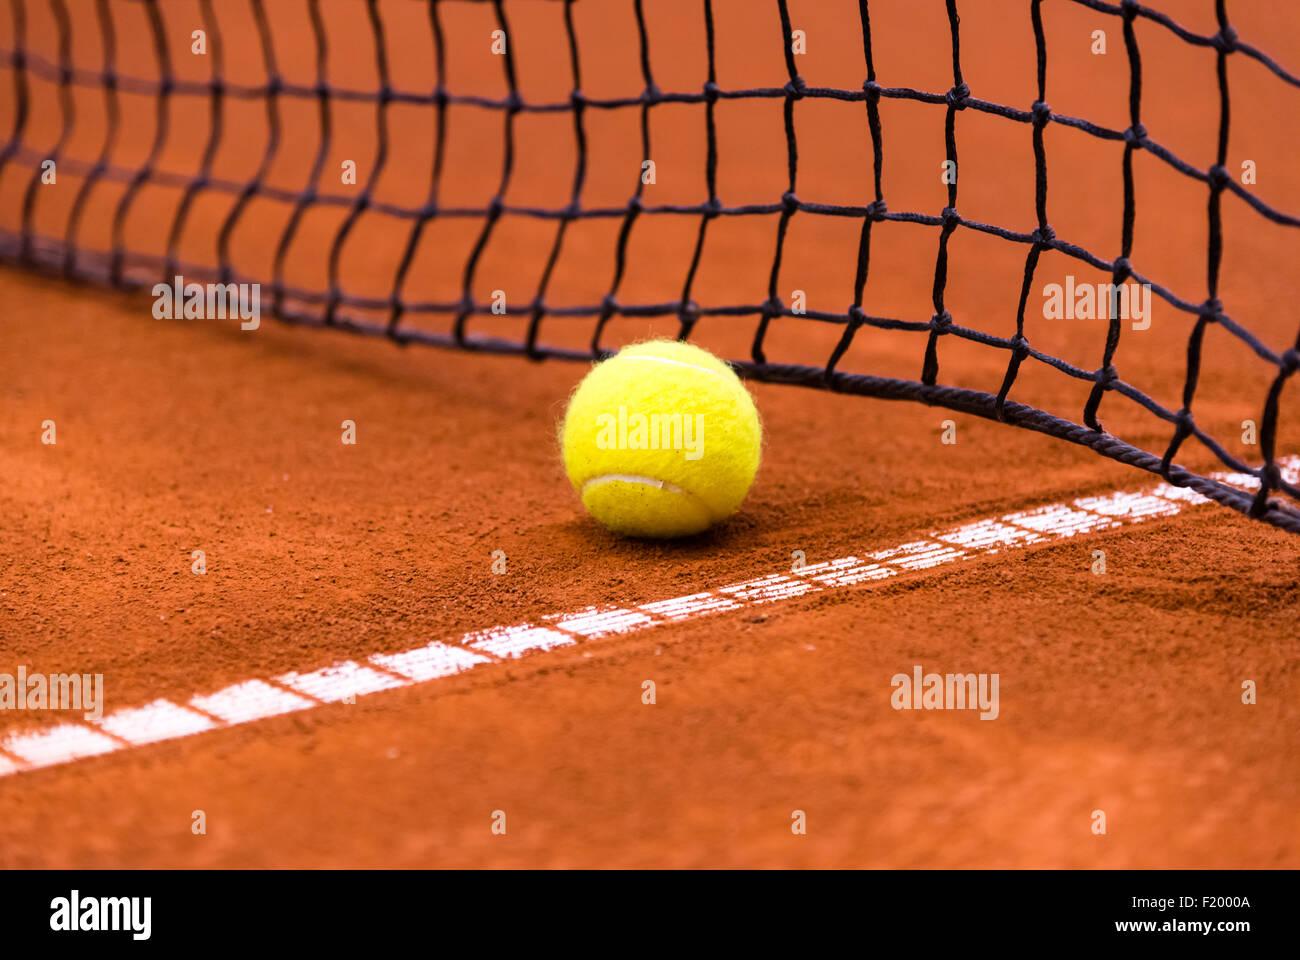 Amarillo pelota de tenis en una cancha de arcilla roja Imagen De Stock